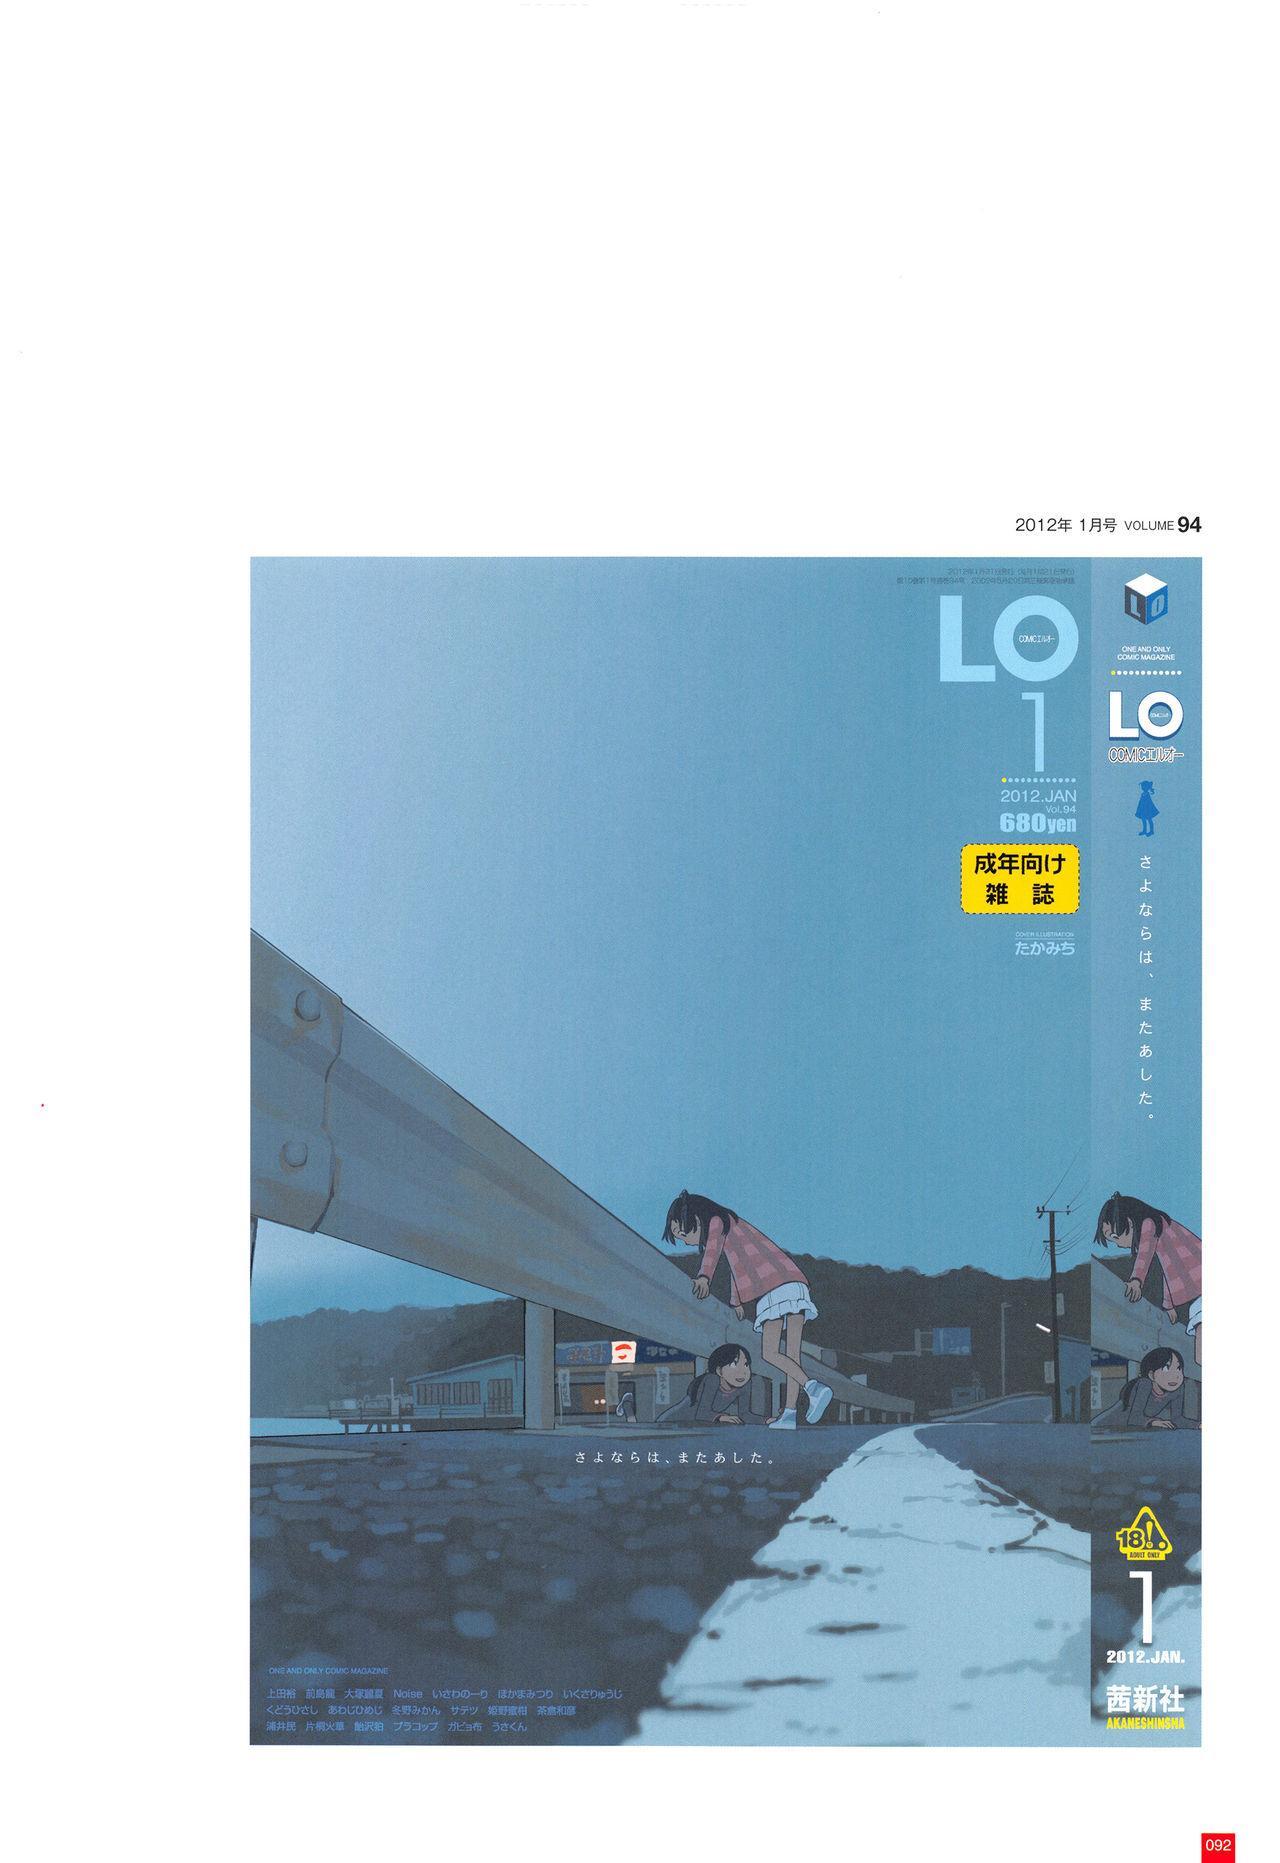 LO Artbook 2-A TAKAMICHI LOOP WORKS 94